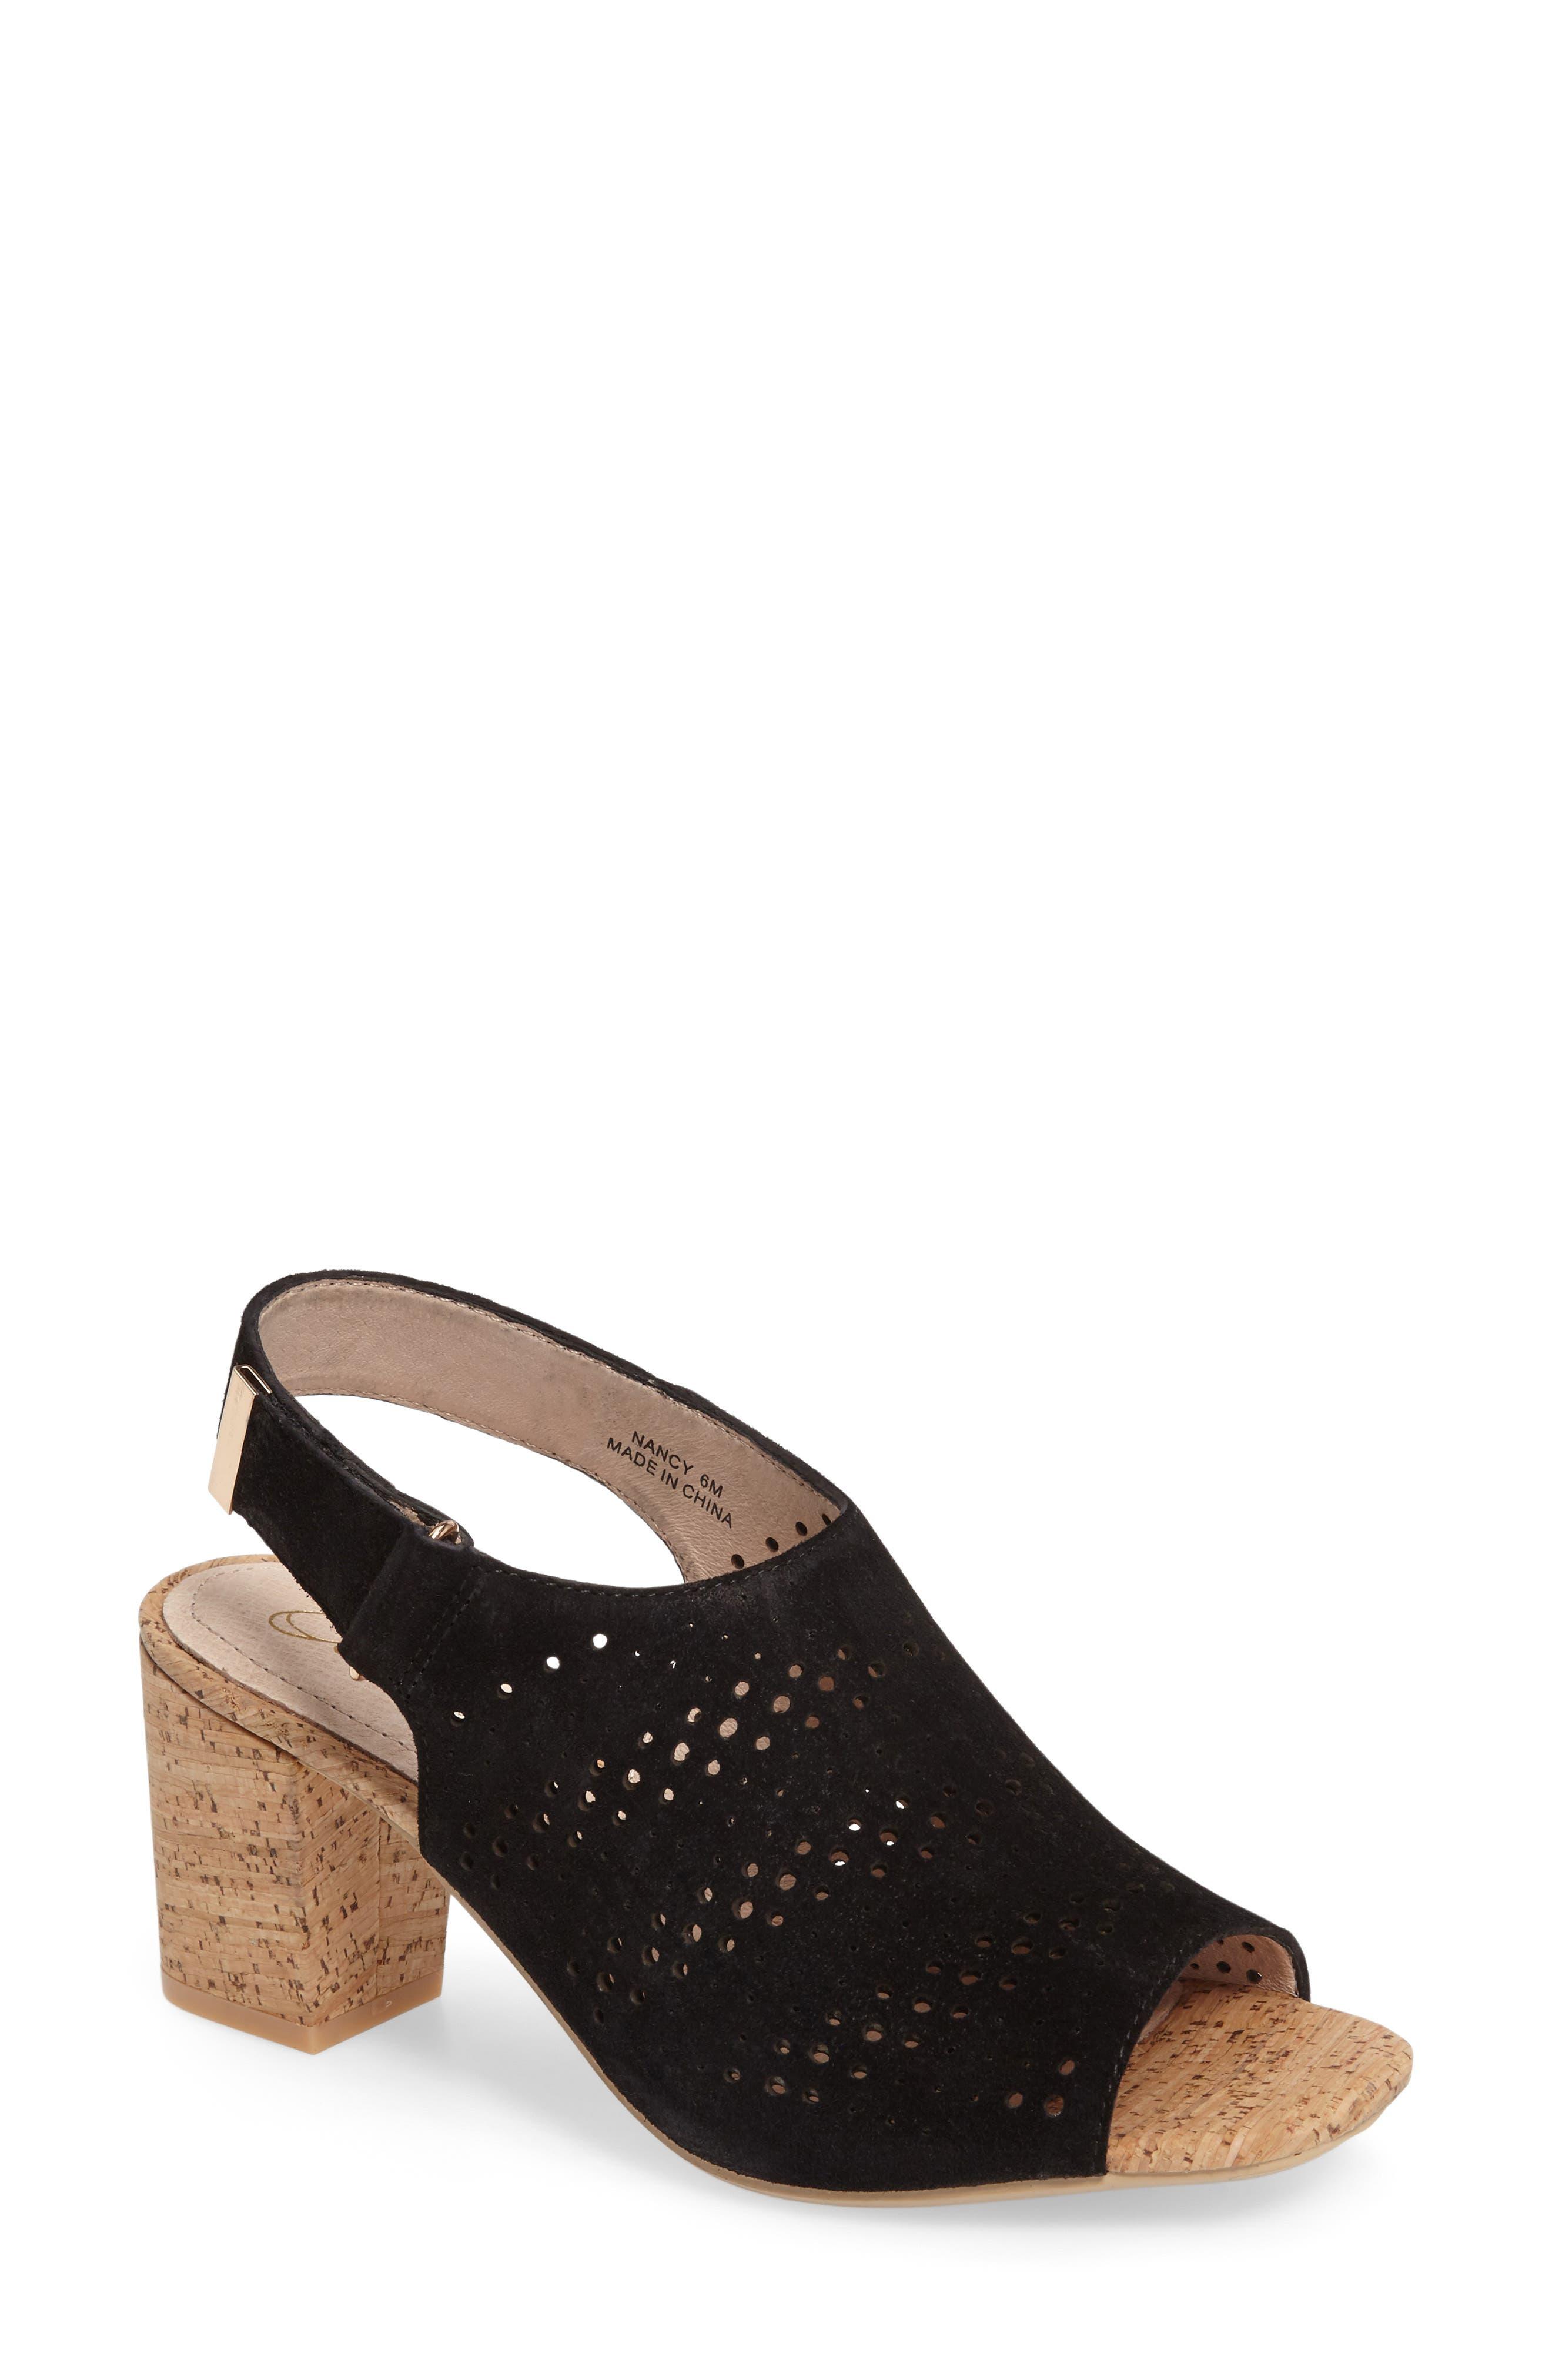 SUDINI Nancy Perforated Sandal